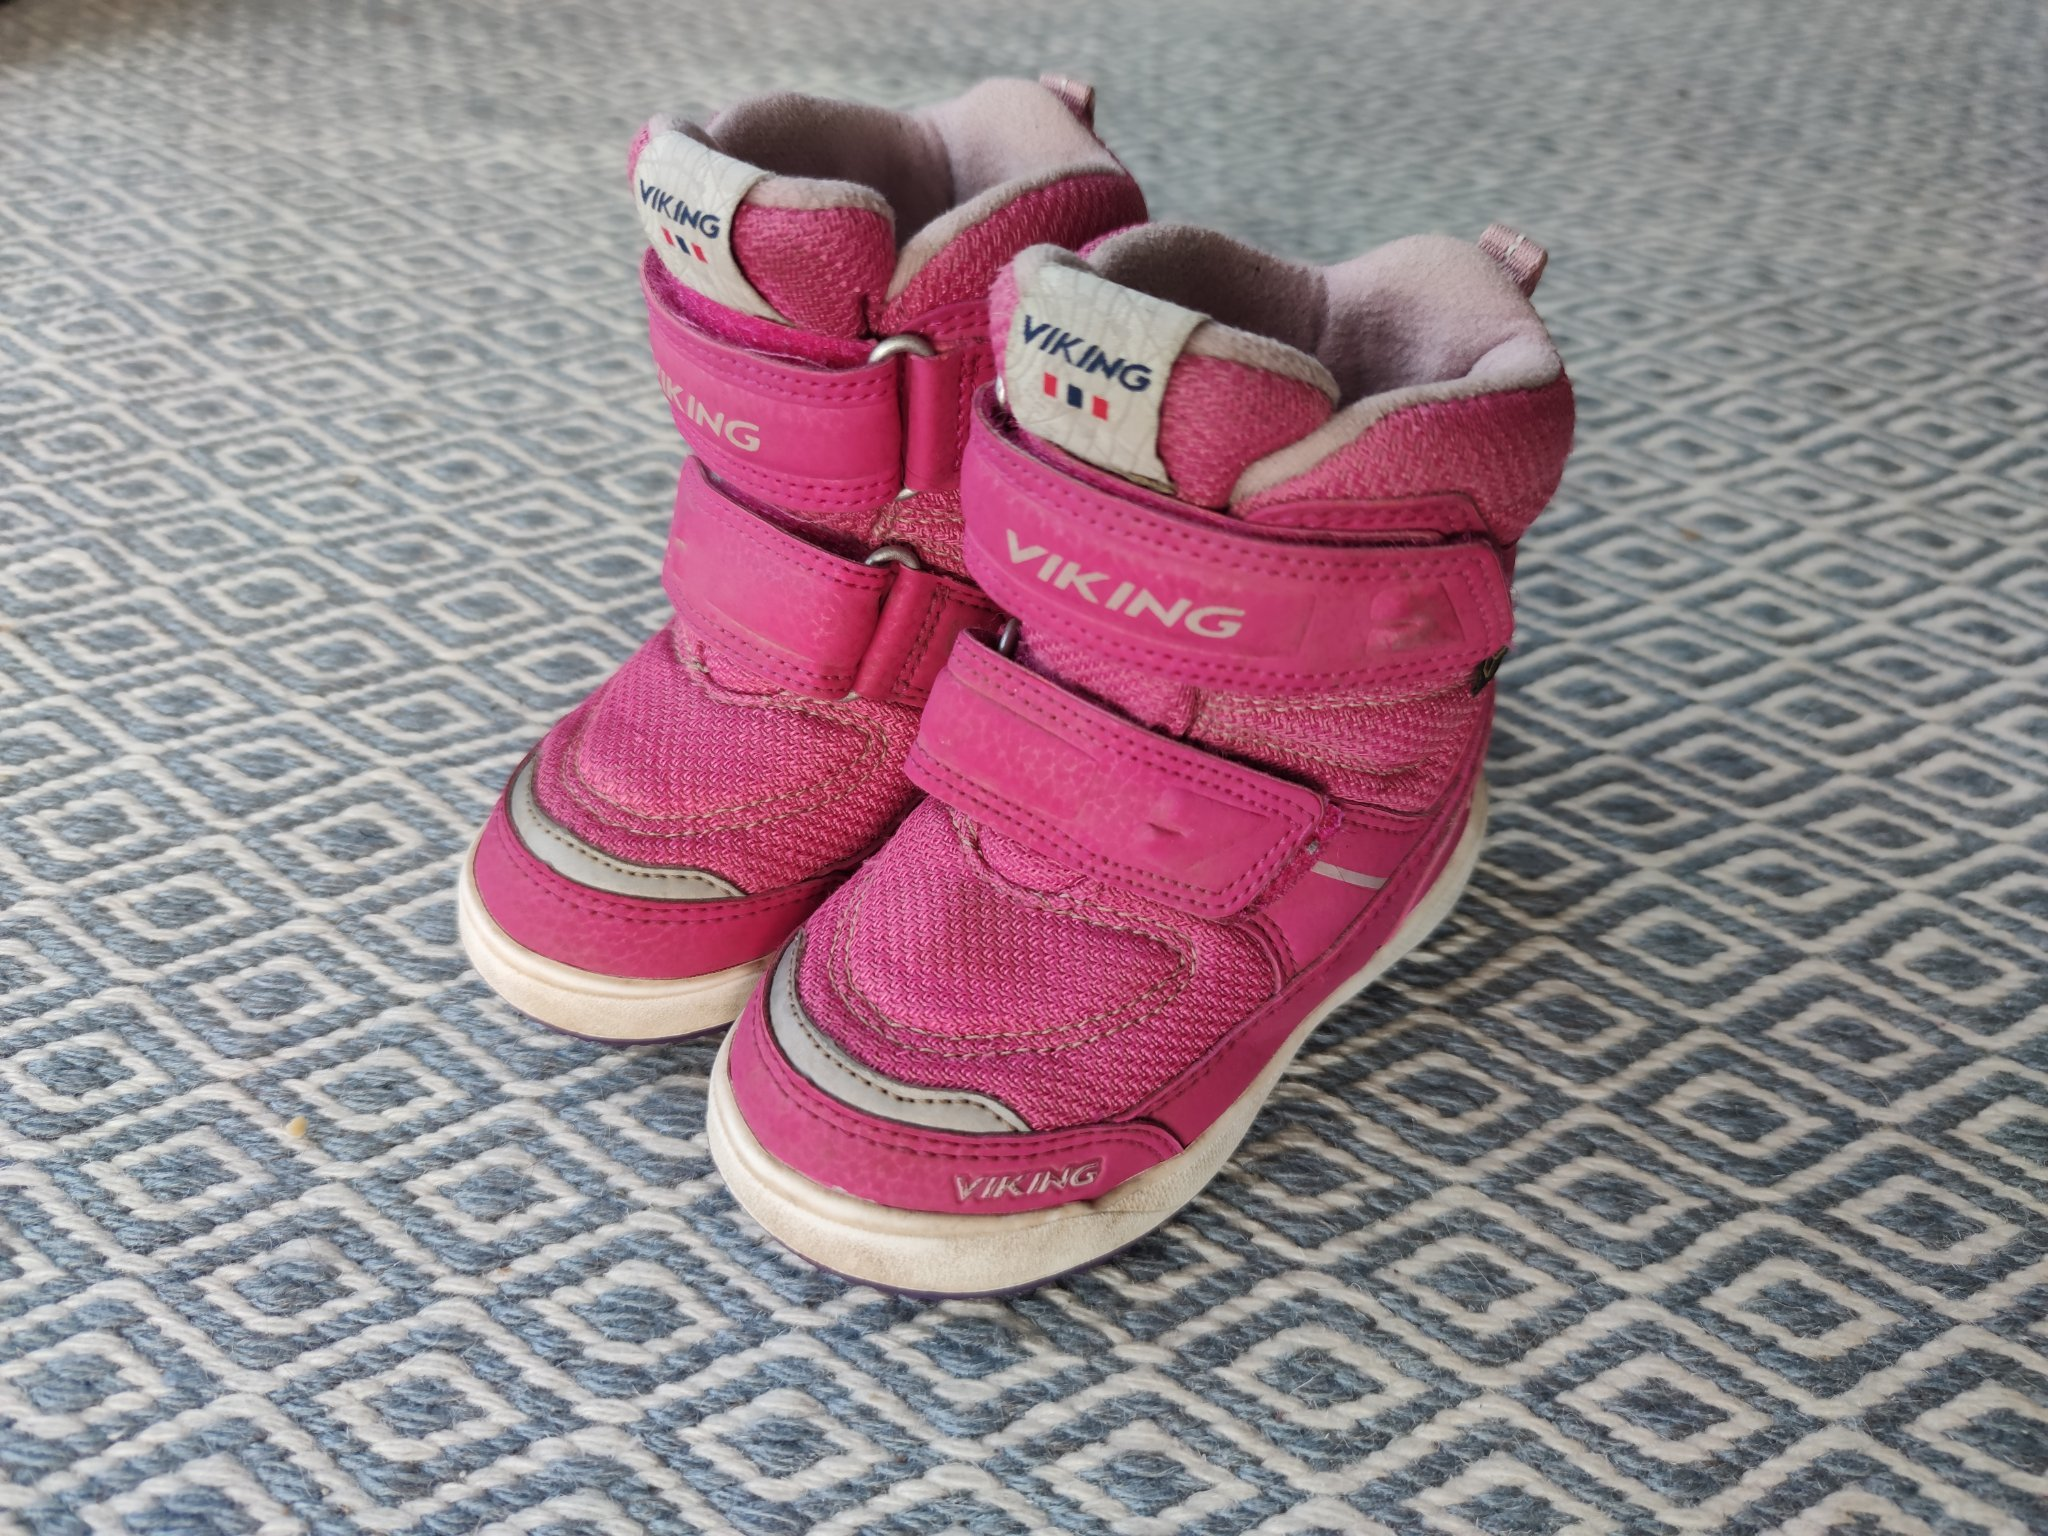 Viking skor söta storlek 23 rosa vikingskor känga vinterskor goretex